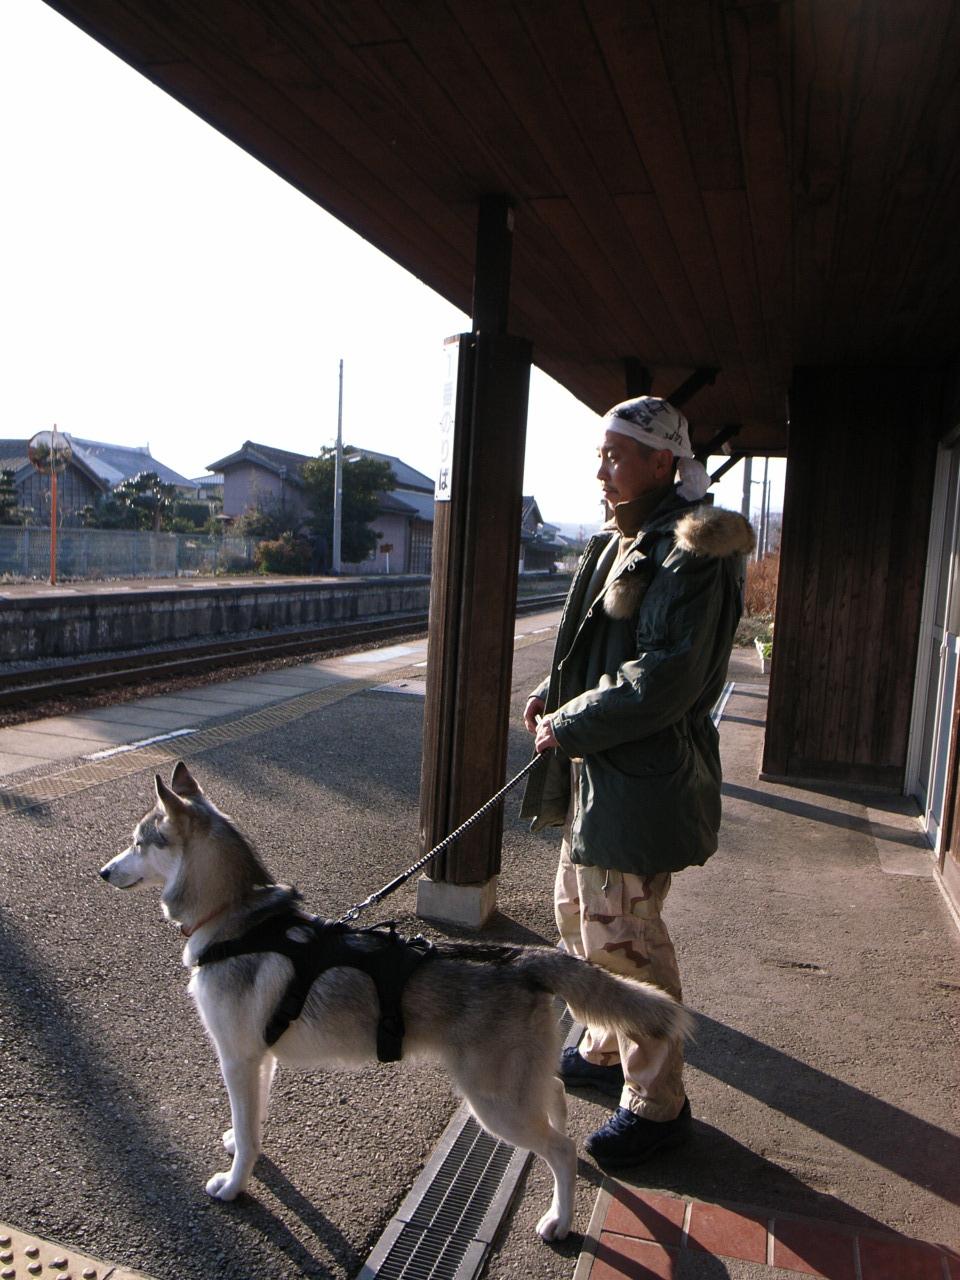 Shikoku Pilgrimage with Hana2  Dec.25th 2005_c0049299_1433916.jpg